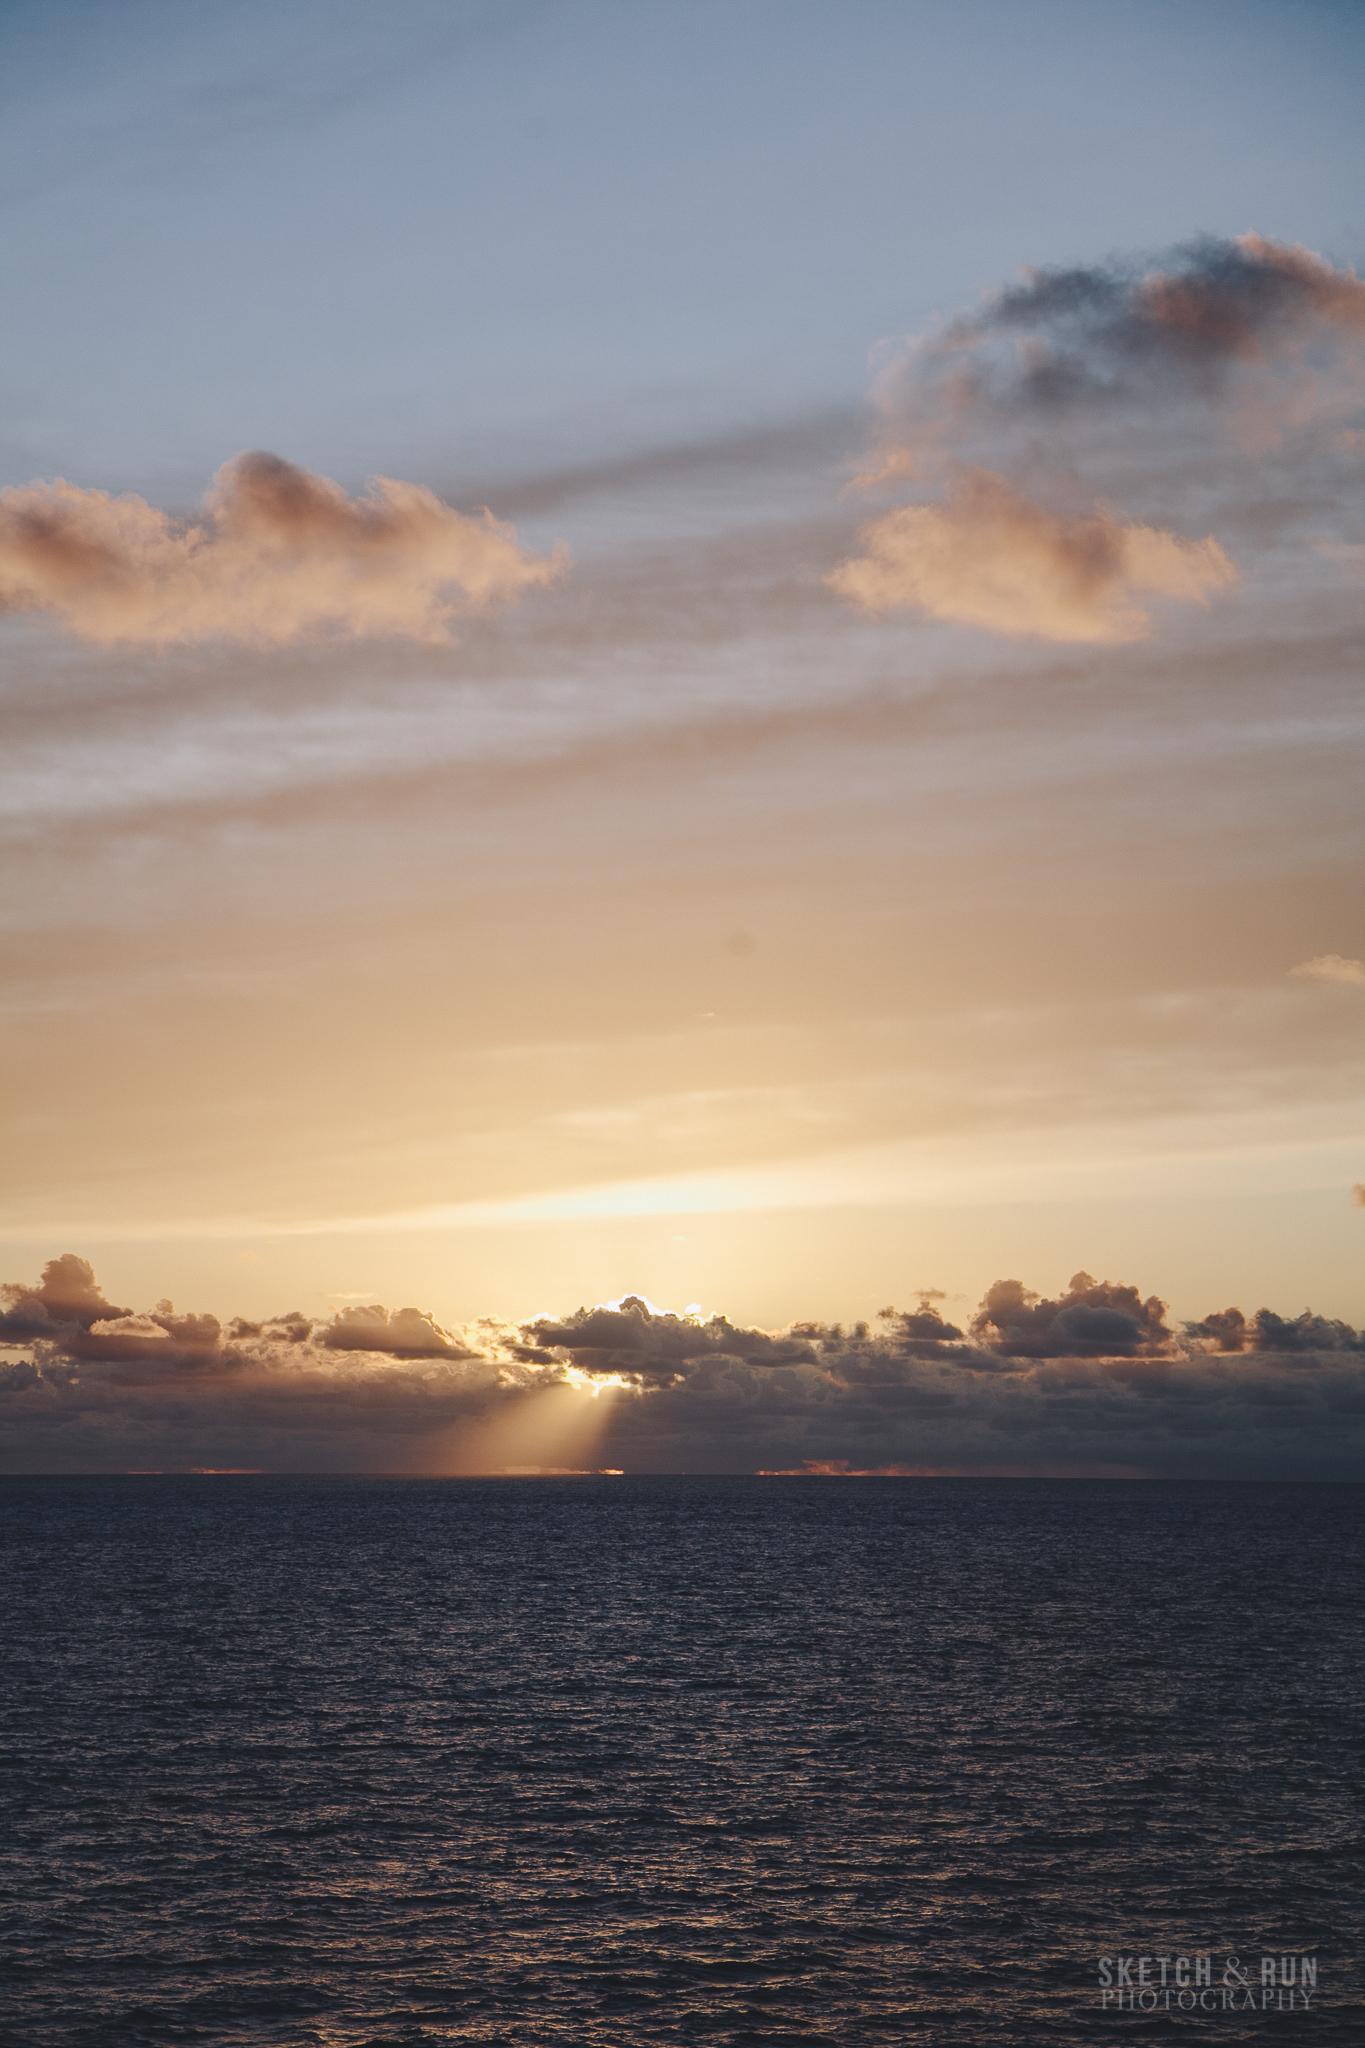 sunrise, ocean, pacific, cruise, explorer of the seas, royal caribbean, light, sun